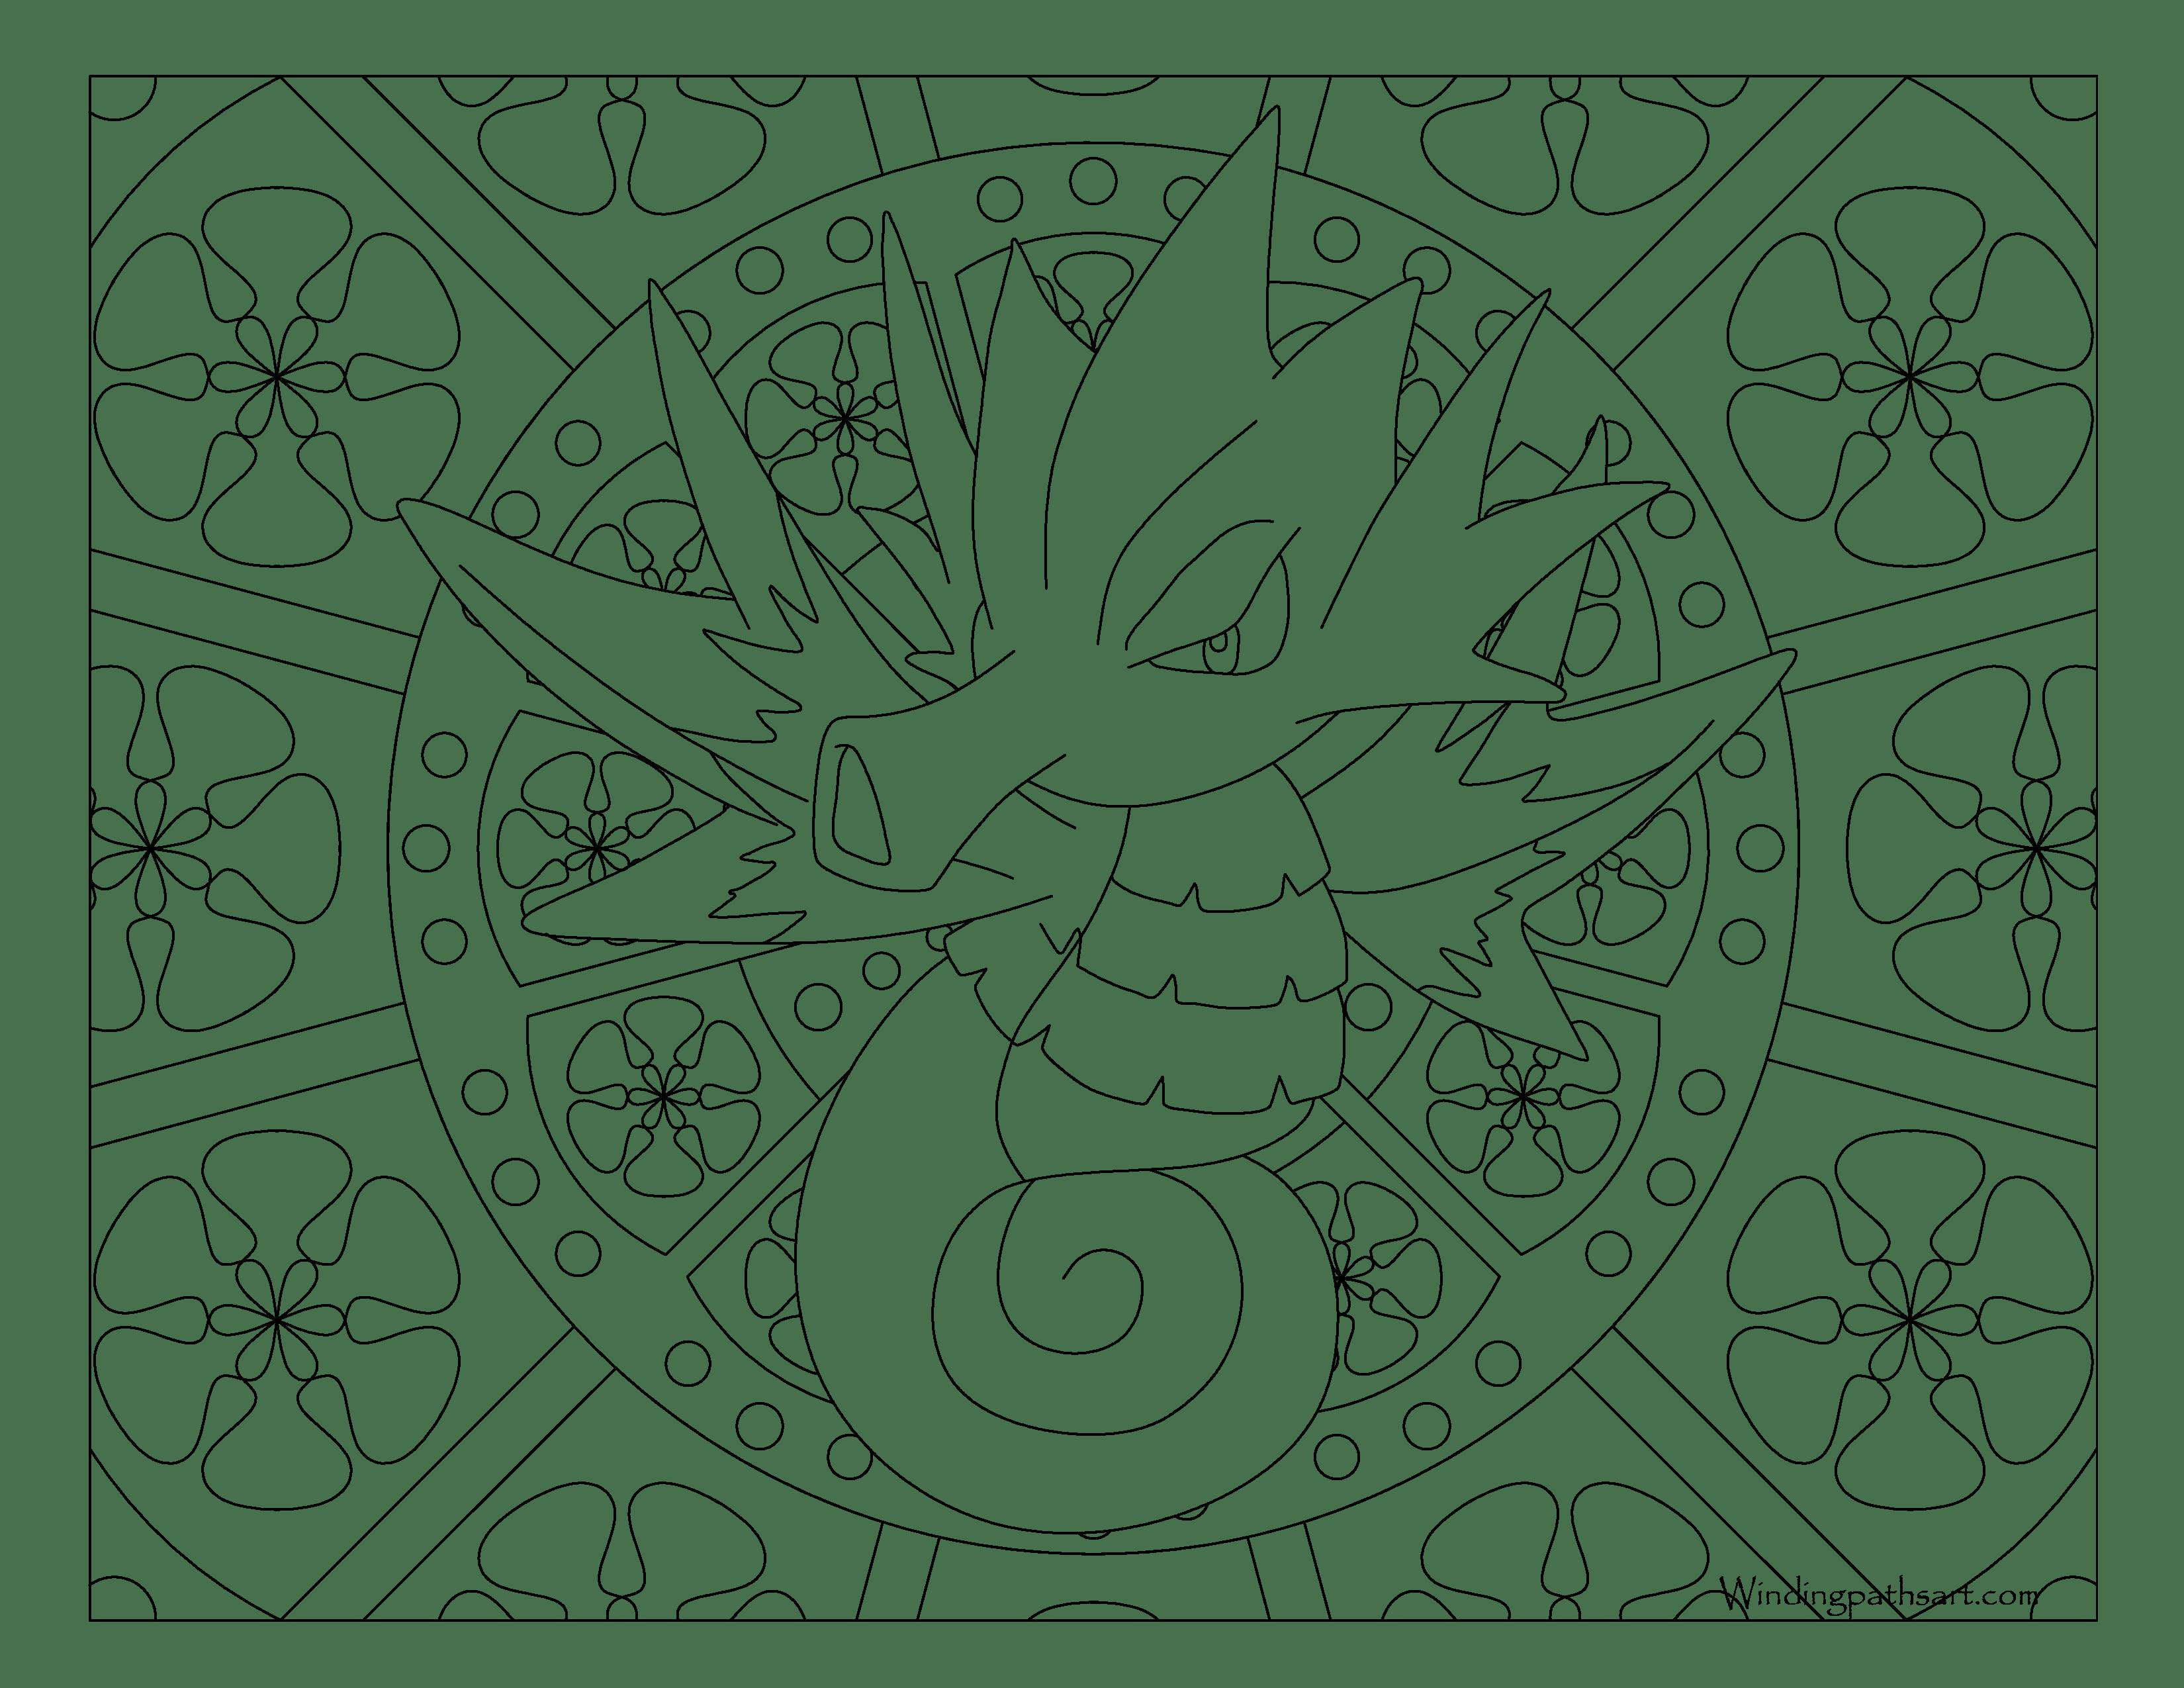 3300x2550 Seadra Pokemon Coloring Page